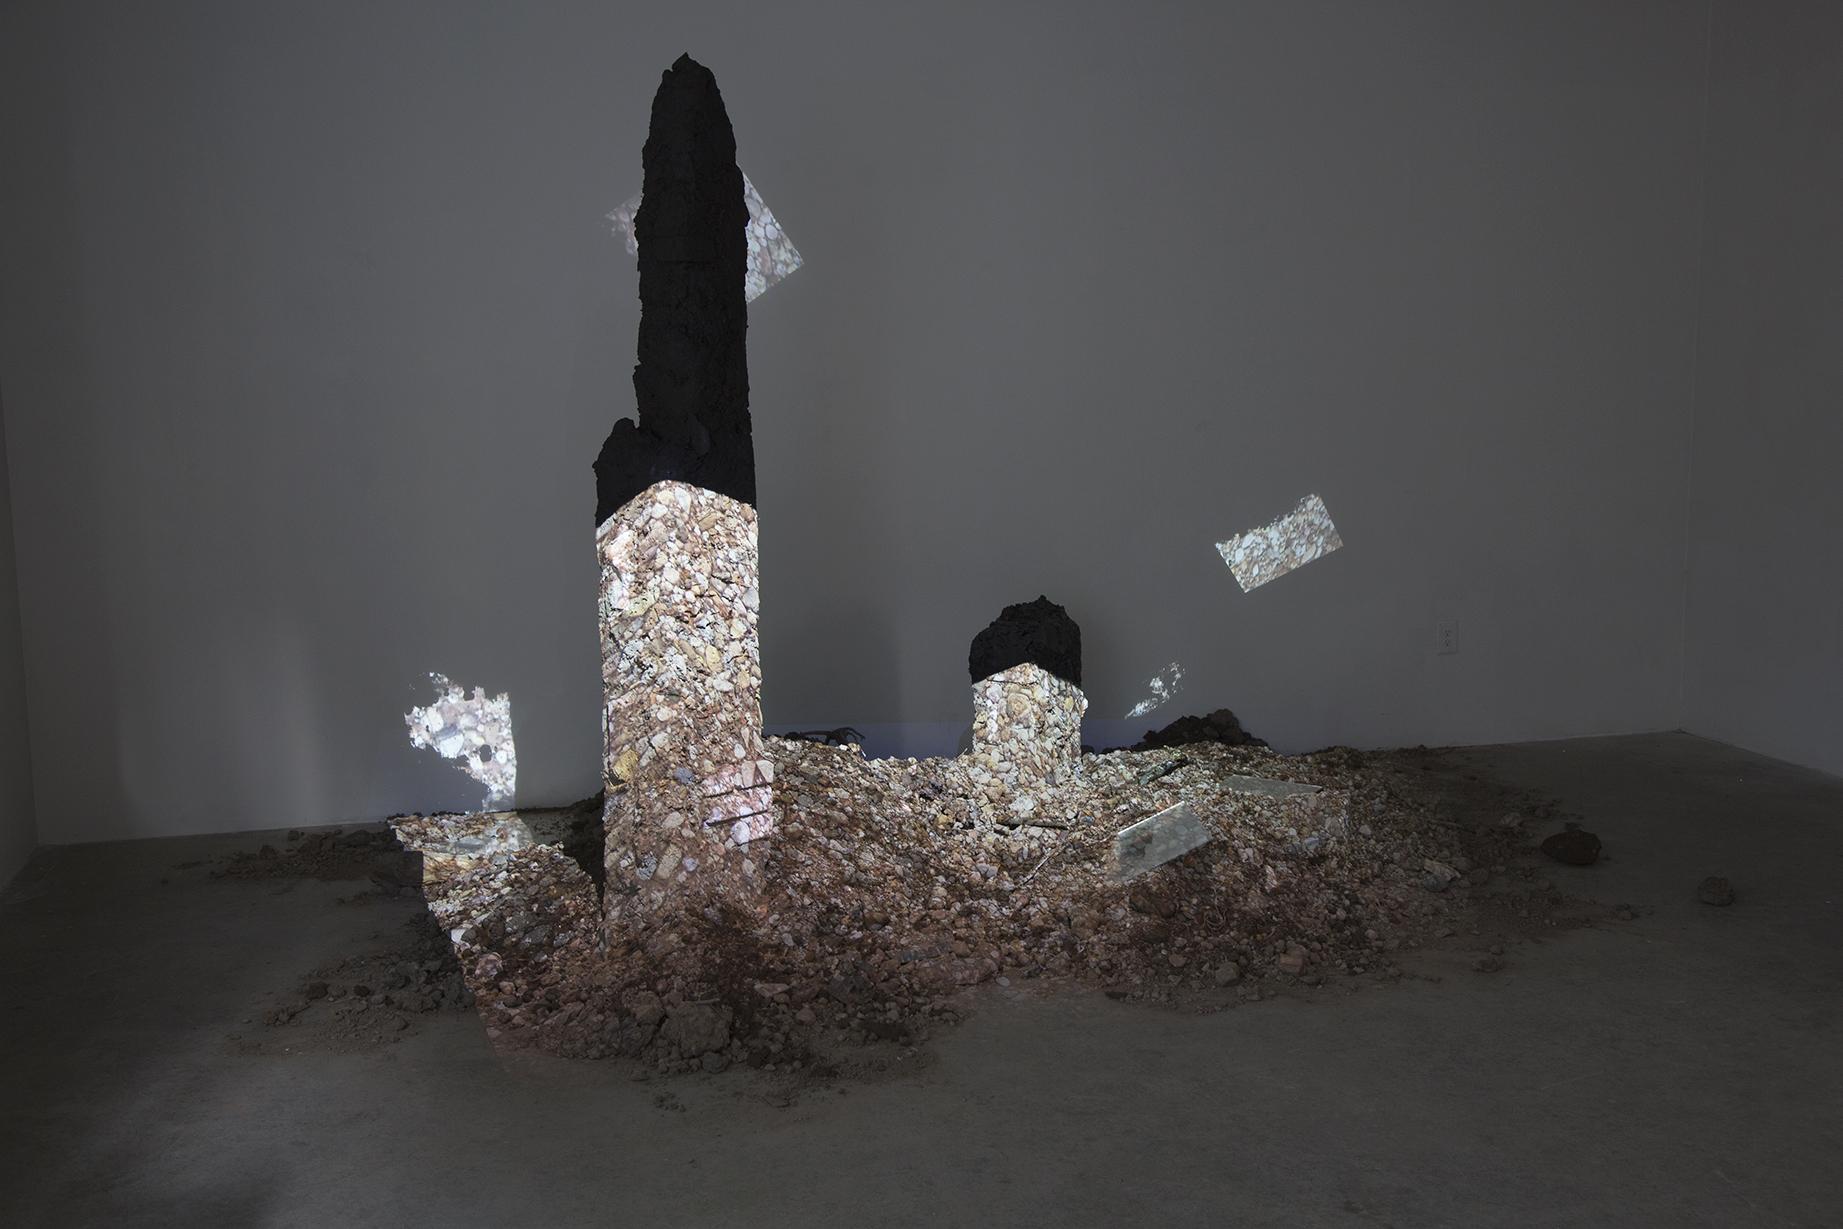 earth, stone, detritus, trash, brick, ammonite fossils, mirror, rubber, sticks, lichen, projected image of New Mexico ground; dimensions variable